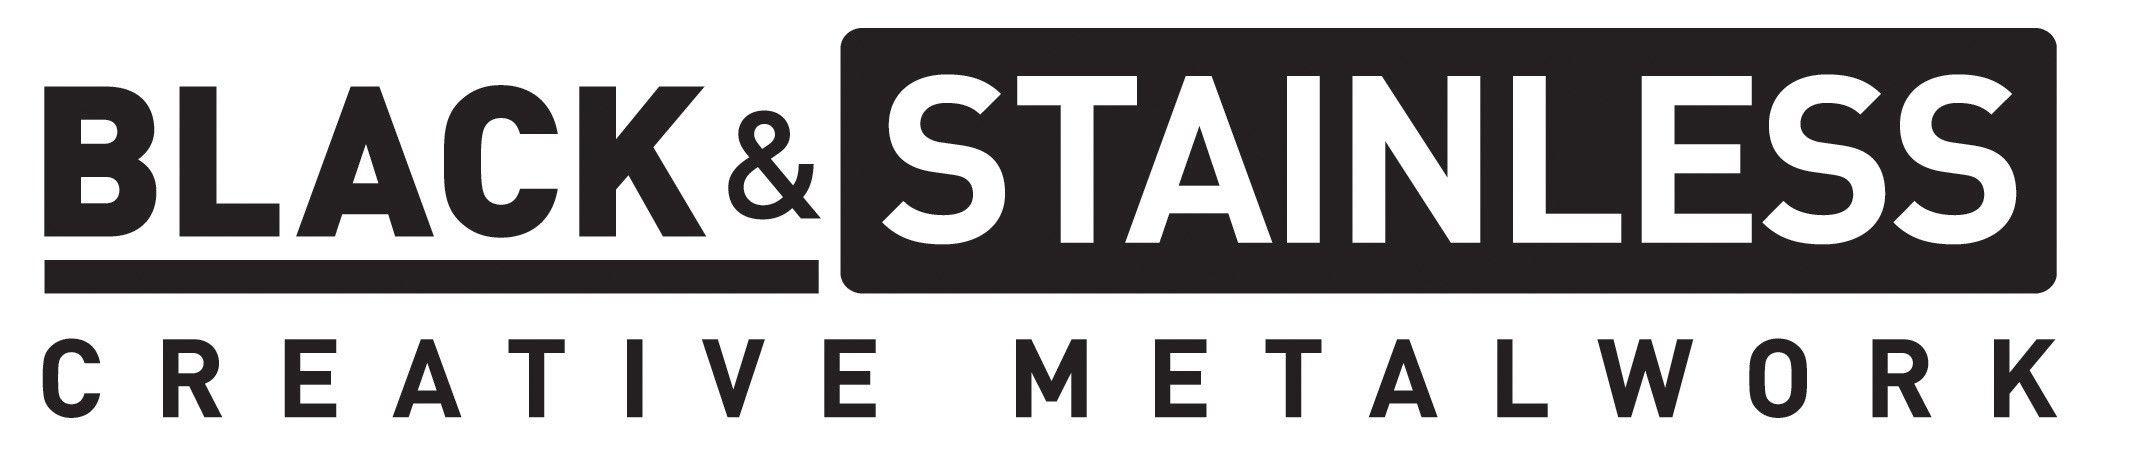 Black & Stainless Creative Metalworks